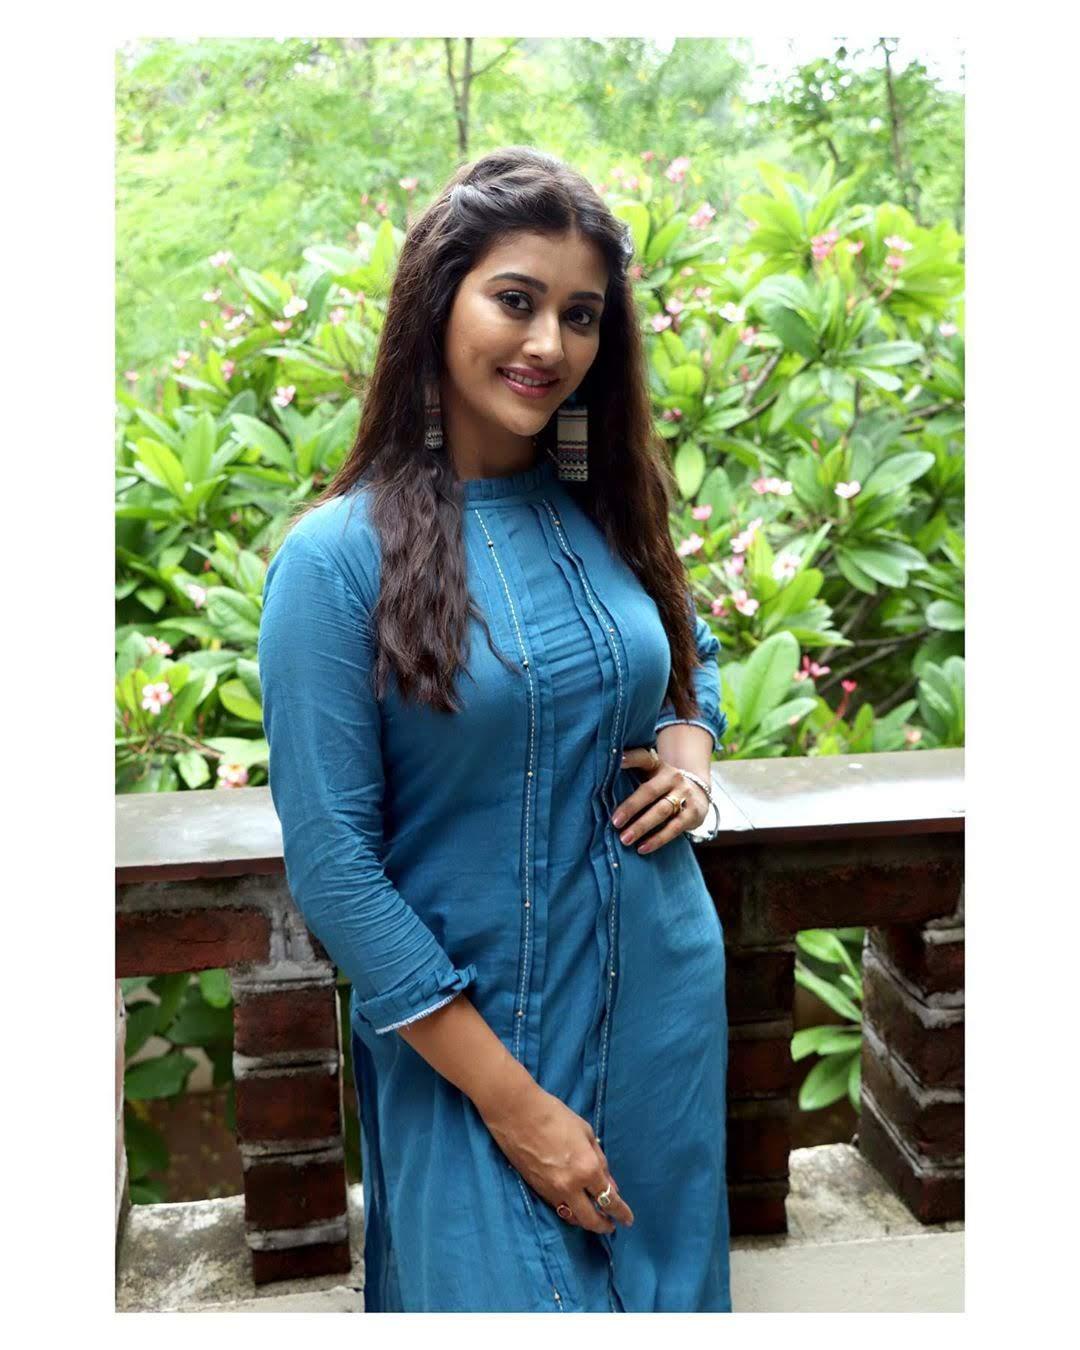 Pooja-Jhaveri-611741